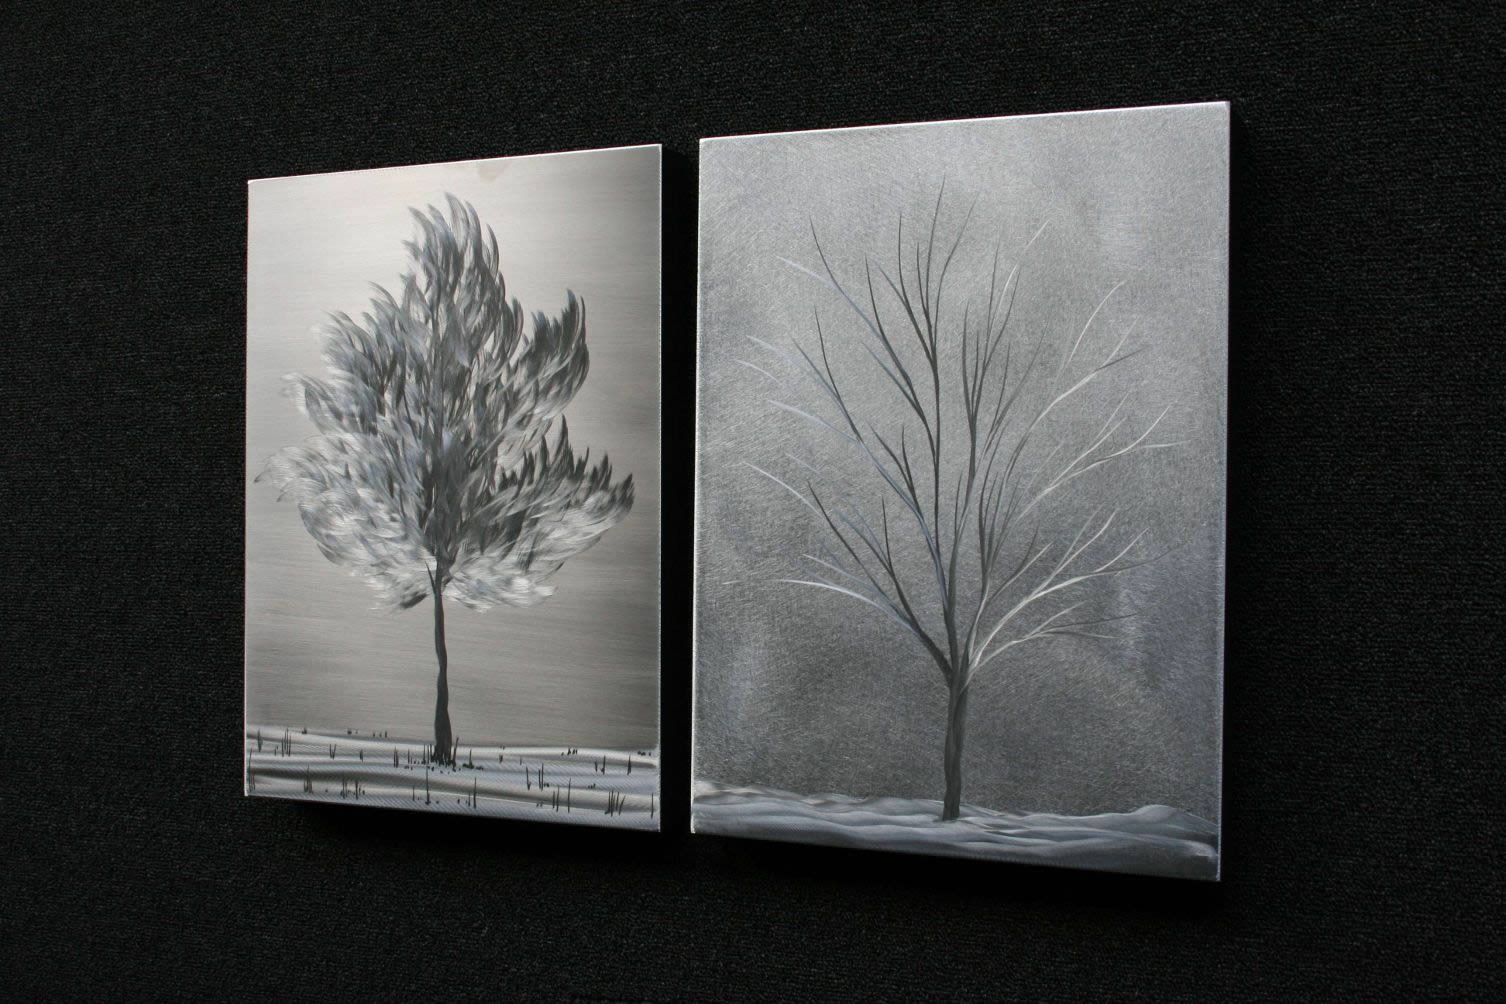 SEASONS LANDSCAPE - Metal Landscape Art by Nicholas Yust